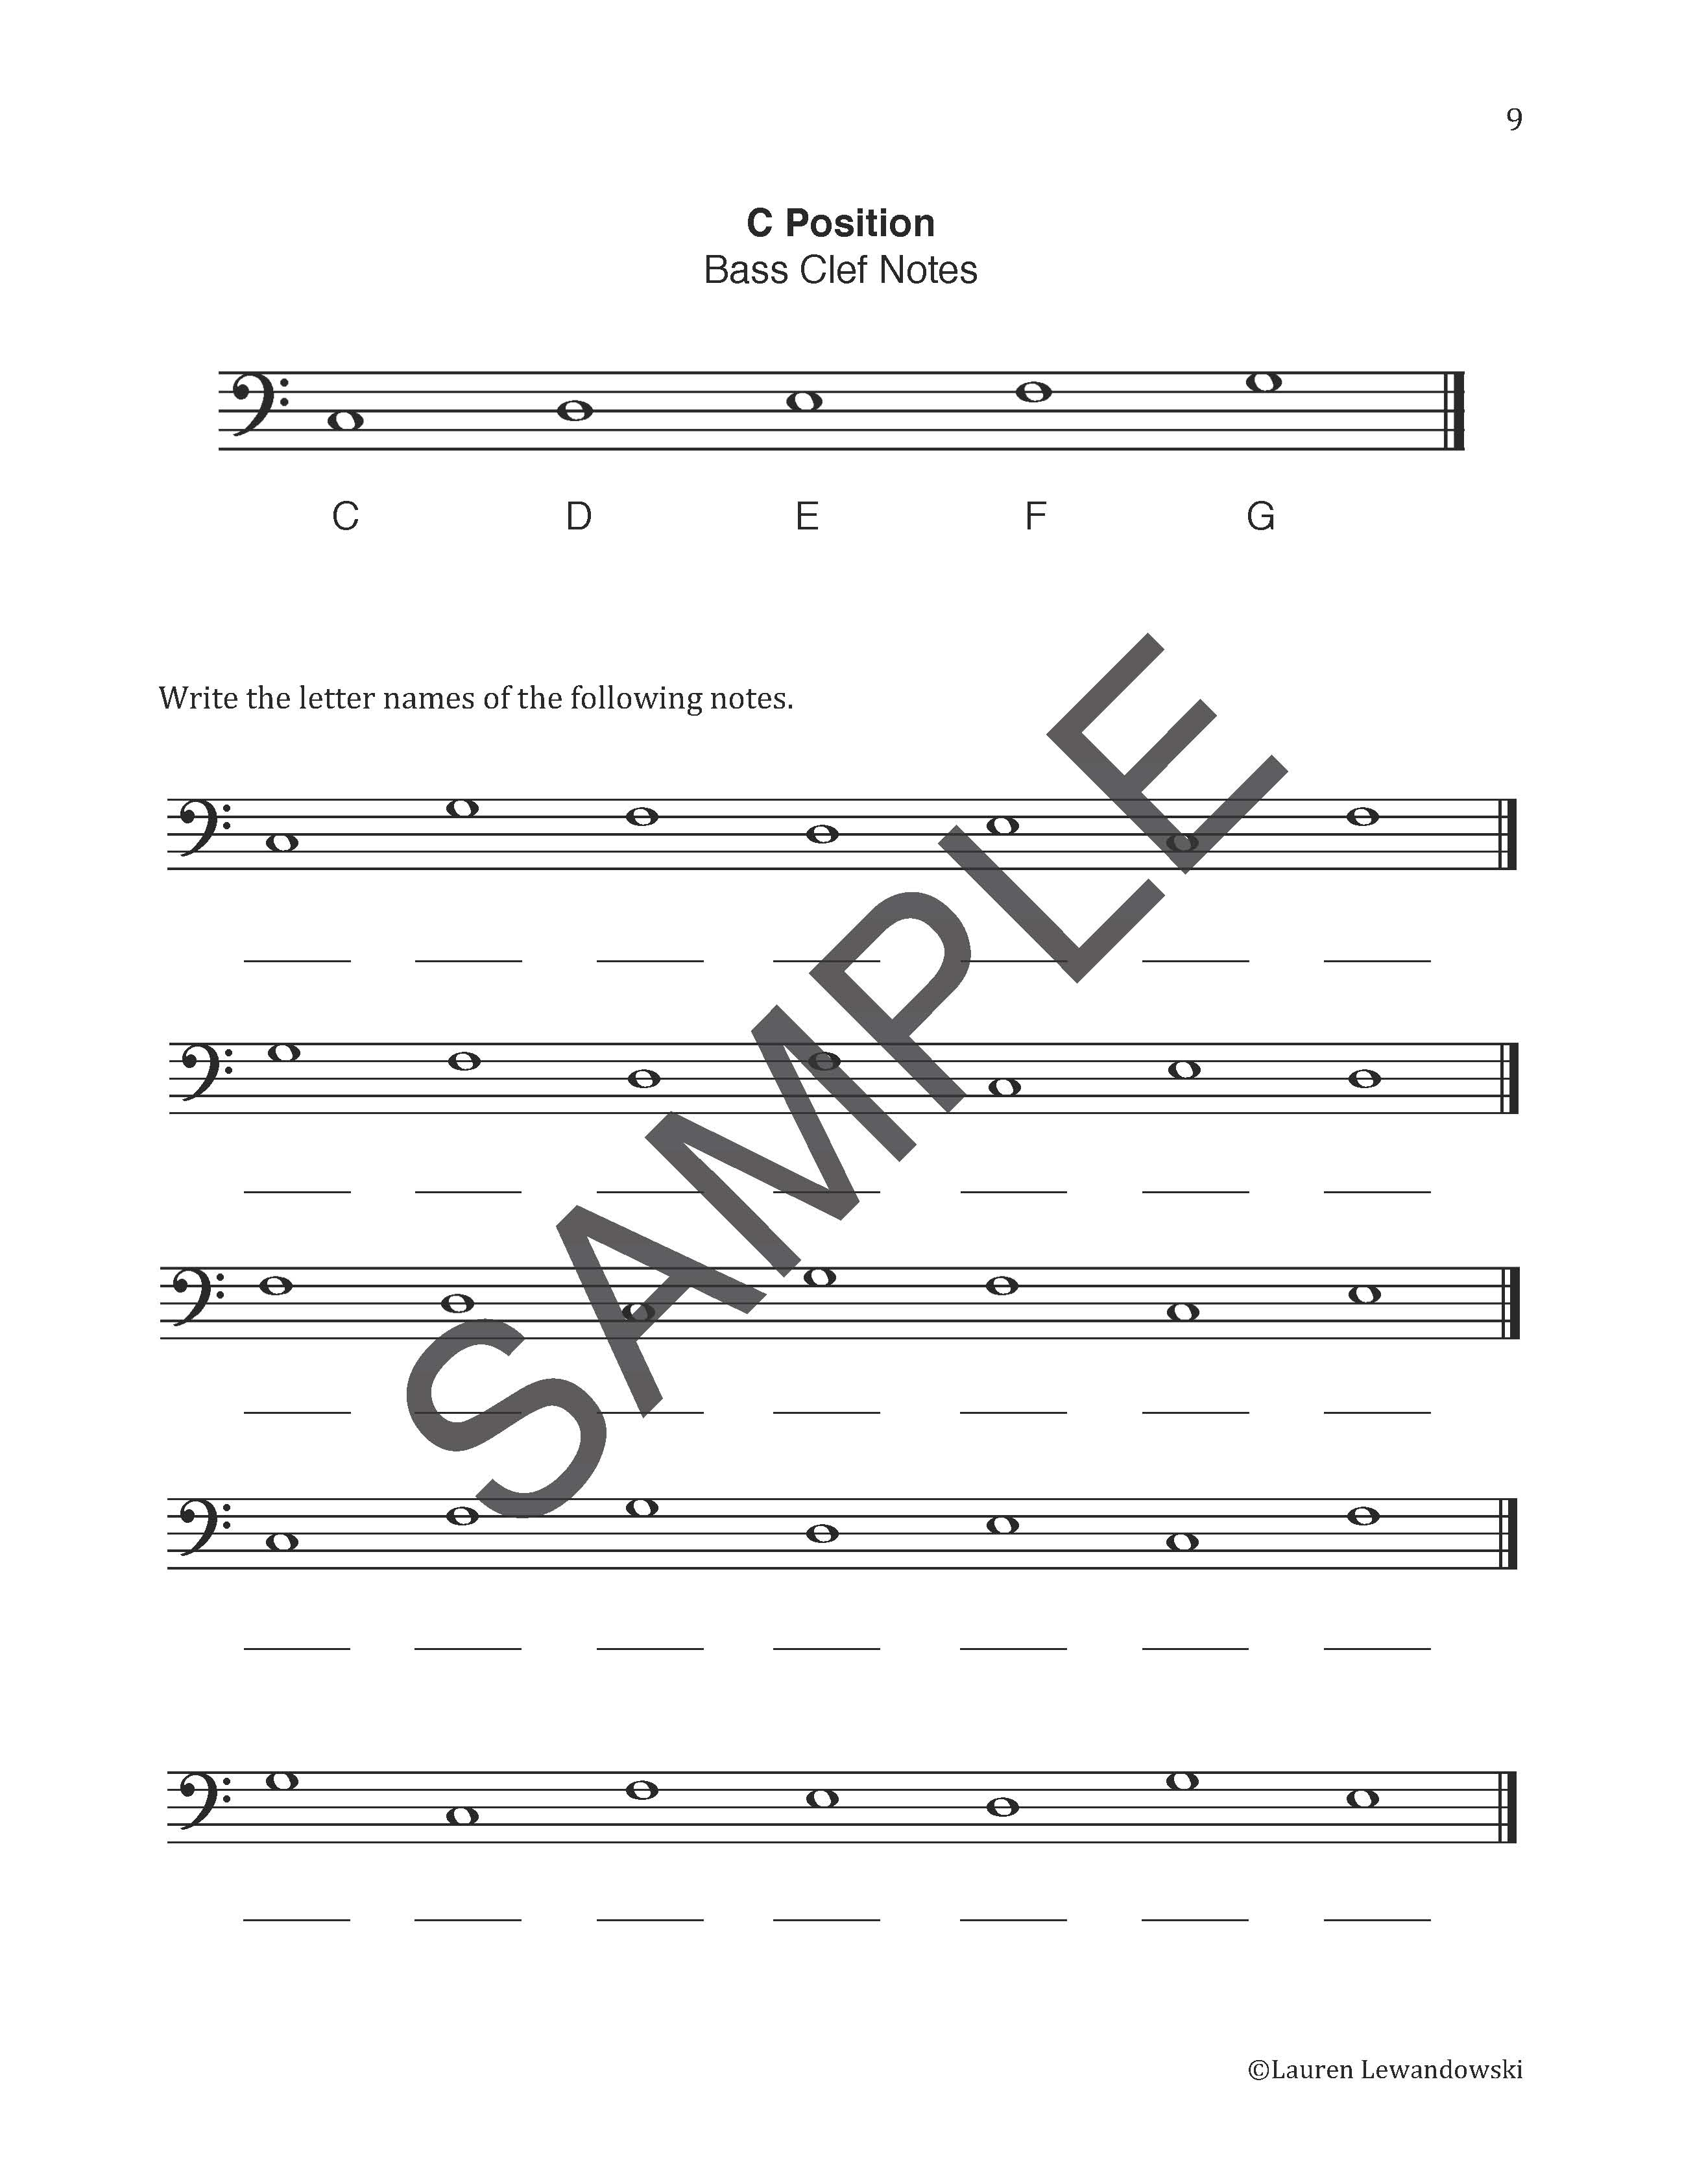 Bass Clef C Position Worksheet